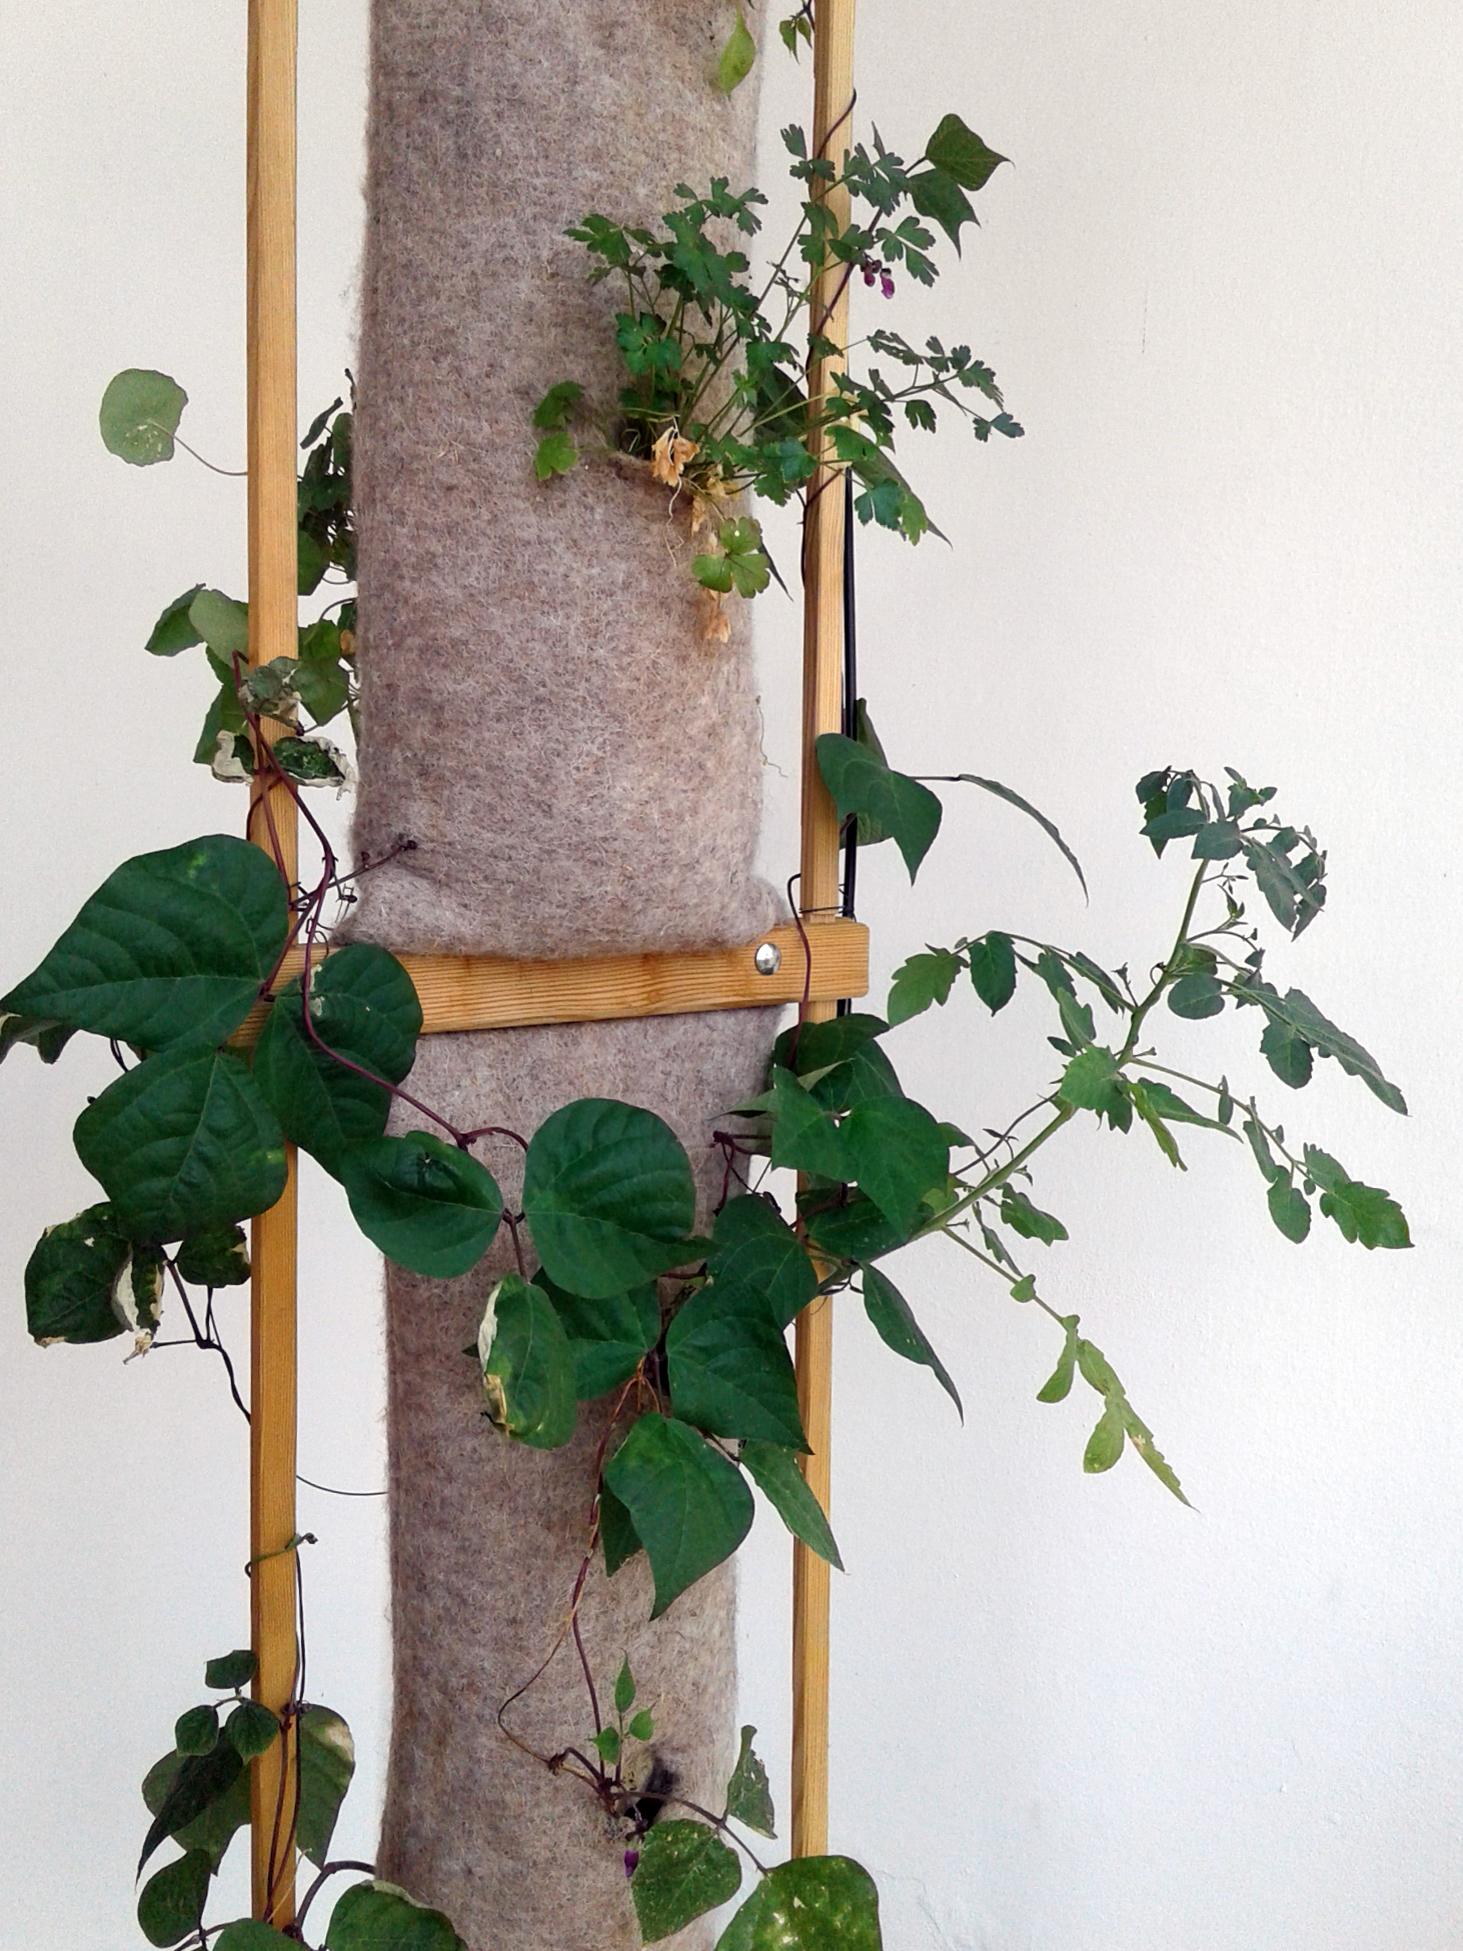 Coltivazione verticale in lana